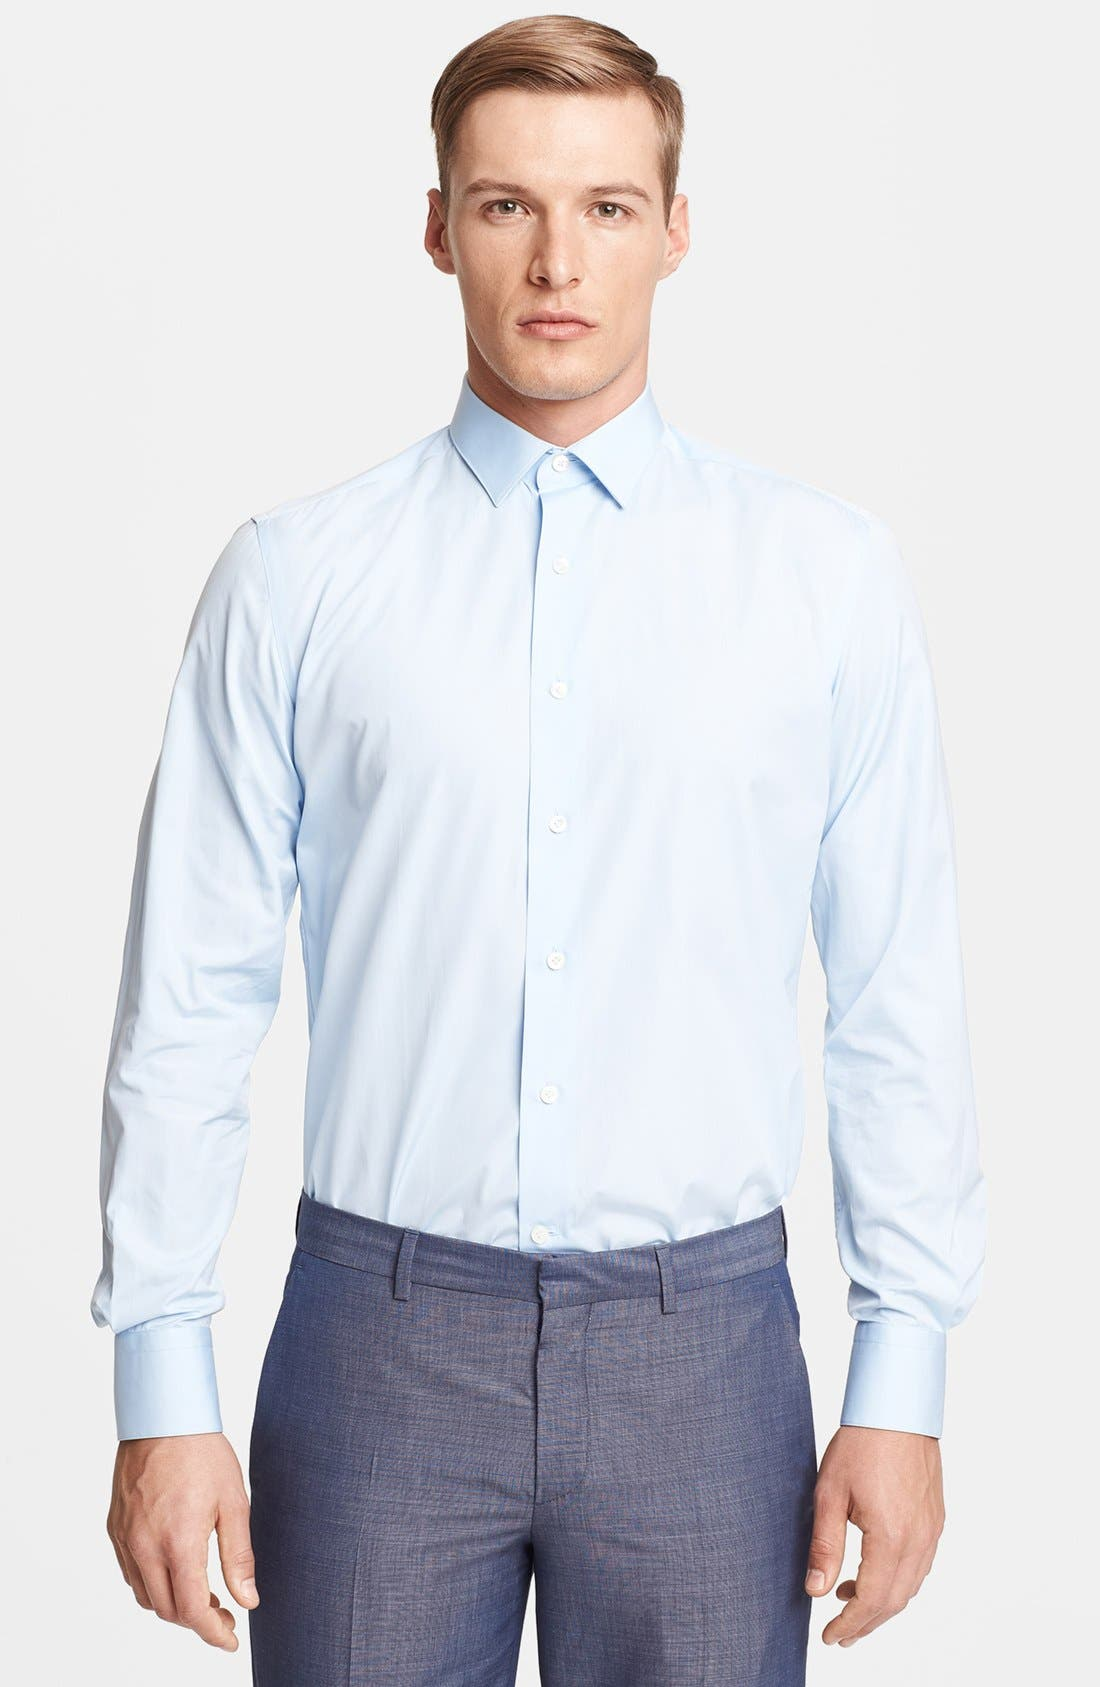 Alternate Image 1 Selected - Lanvin Slim Fit Poplin Dress Shirt